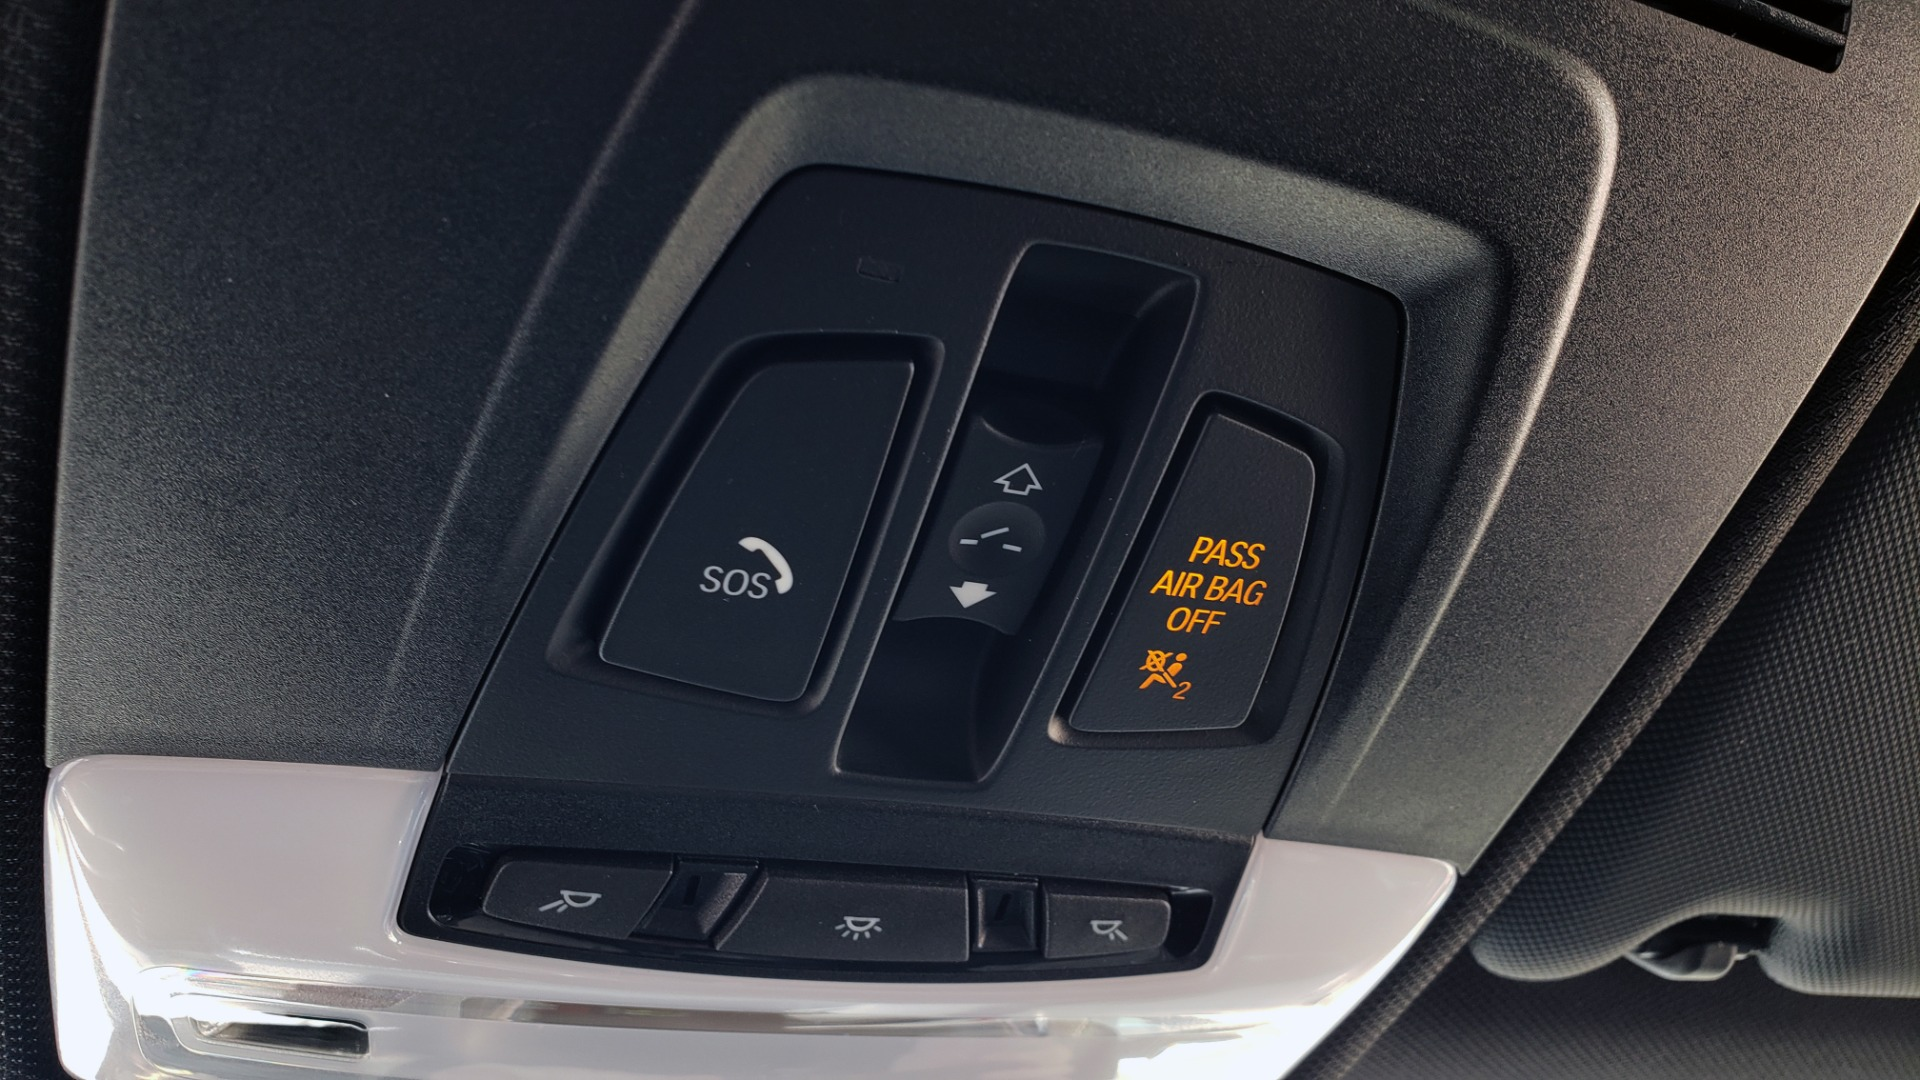 Used 2018 BMW 4 SERIES 430IXDRIVE / PREMIUM / NAV / SUNROOF / ESSENTIALS PKG for sale $27,795 at Formula Imports in Charlotte NC 28227 57